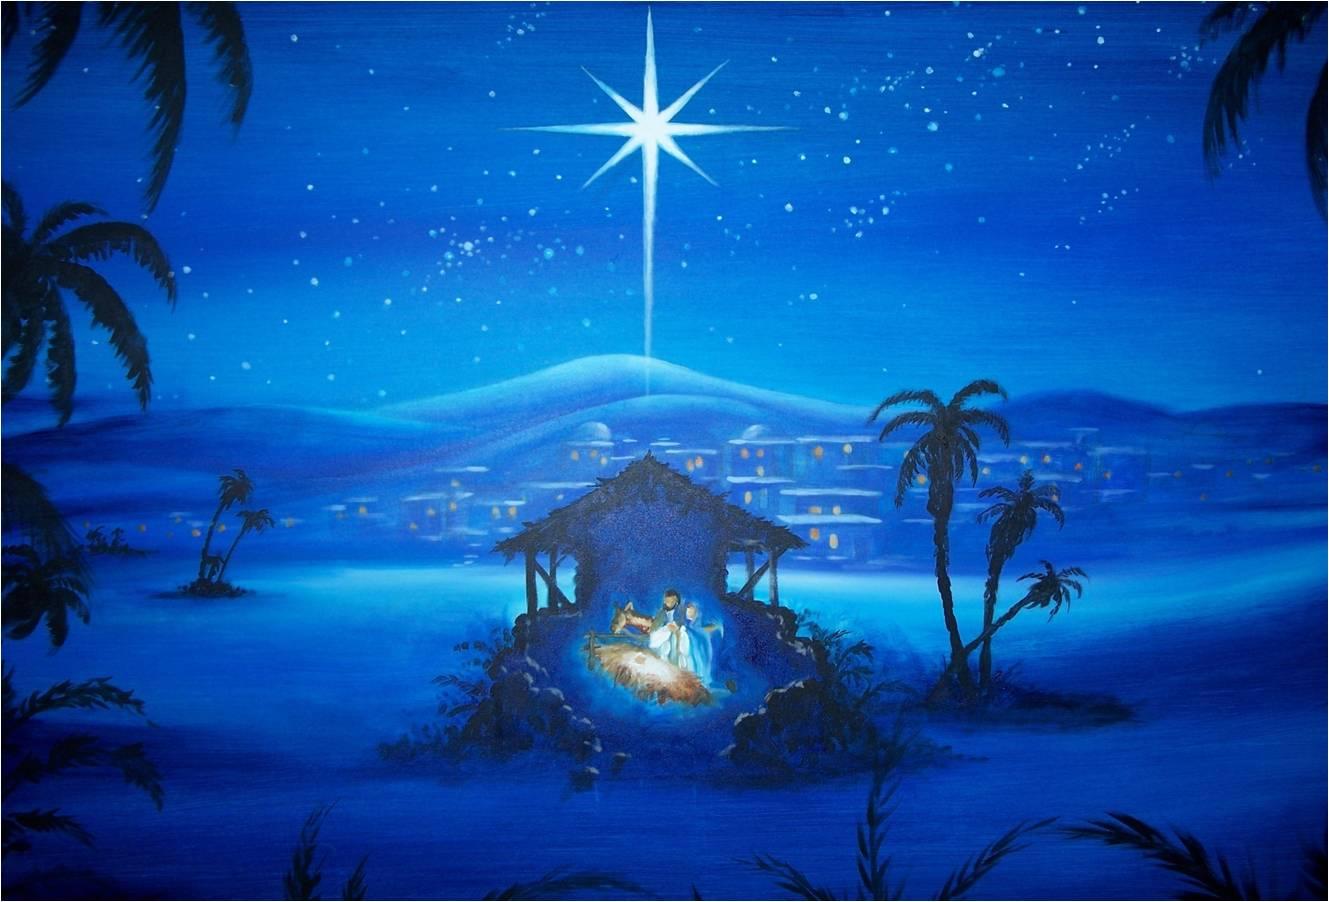 empty manger hd wallpaper - photo #6